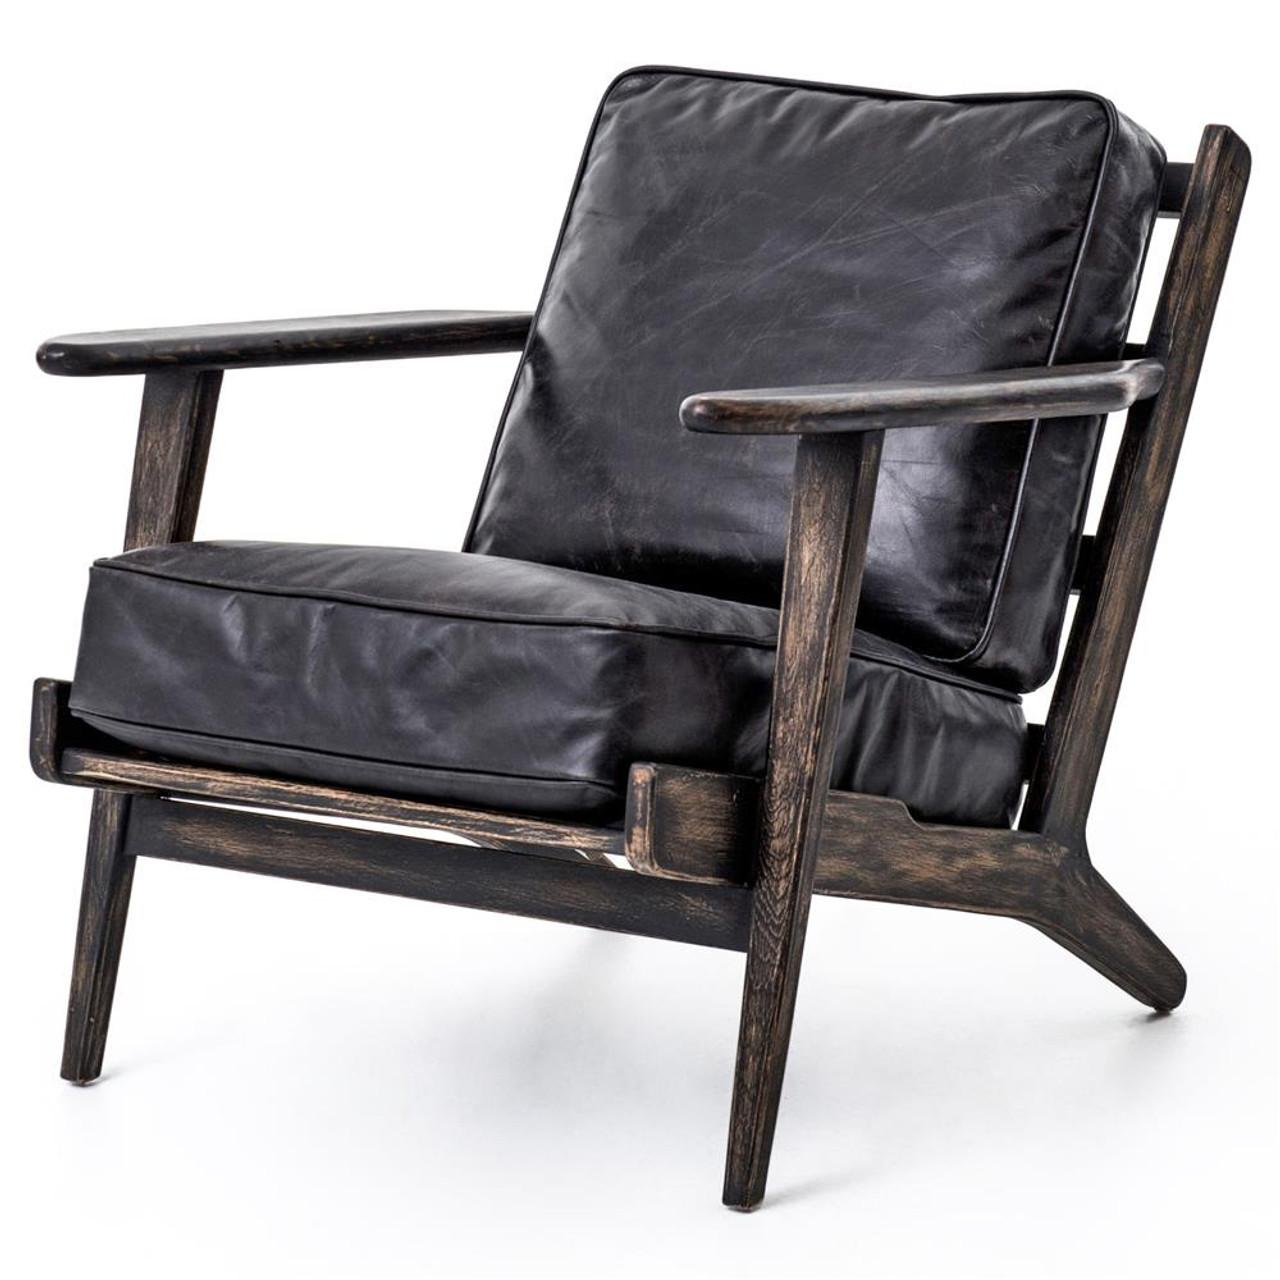 Attirant Mid Century Modern Brooks Leather Lounge Chair